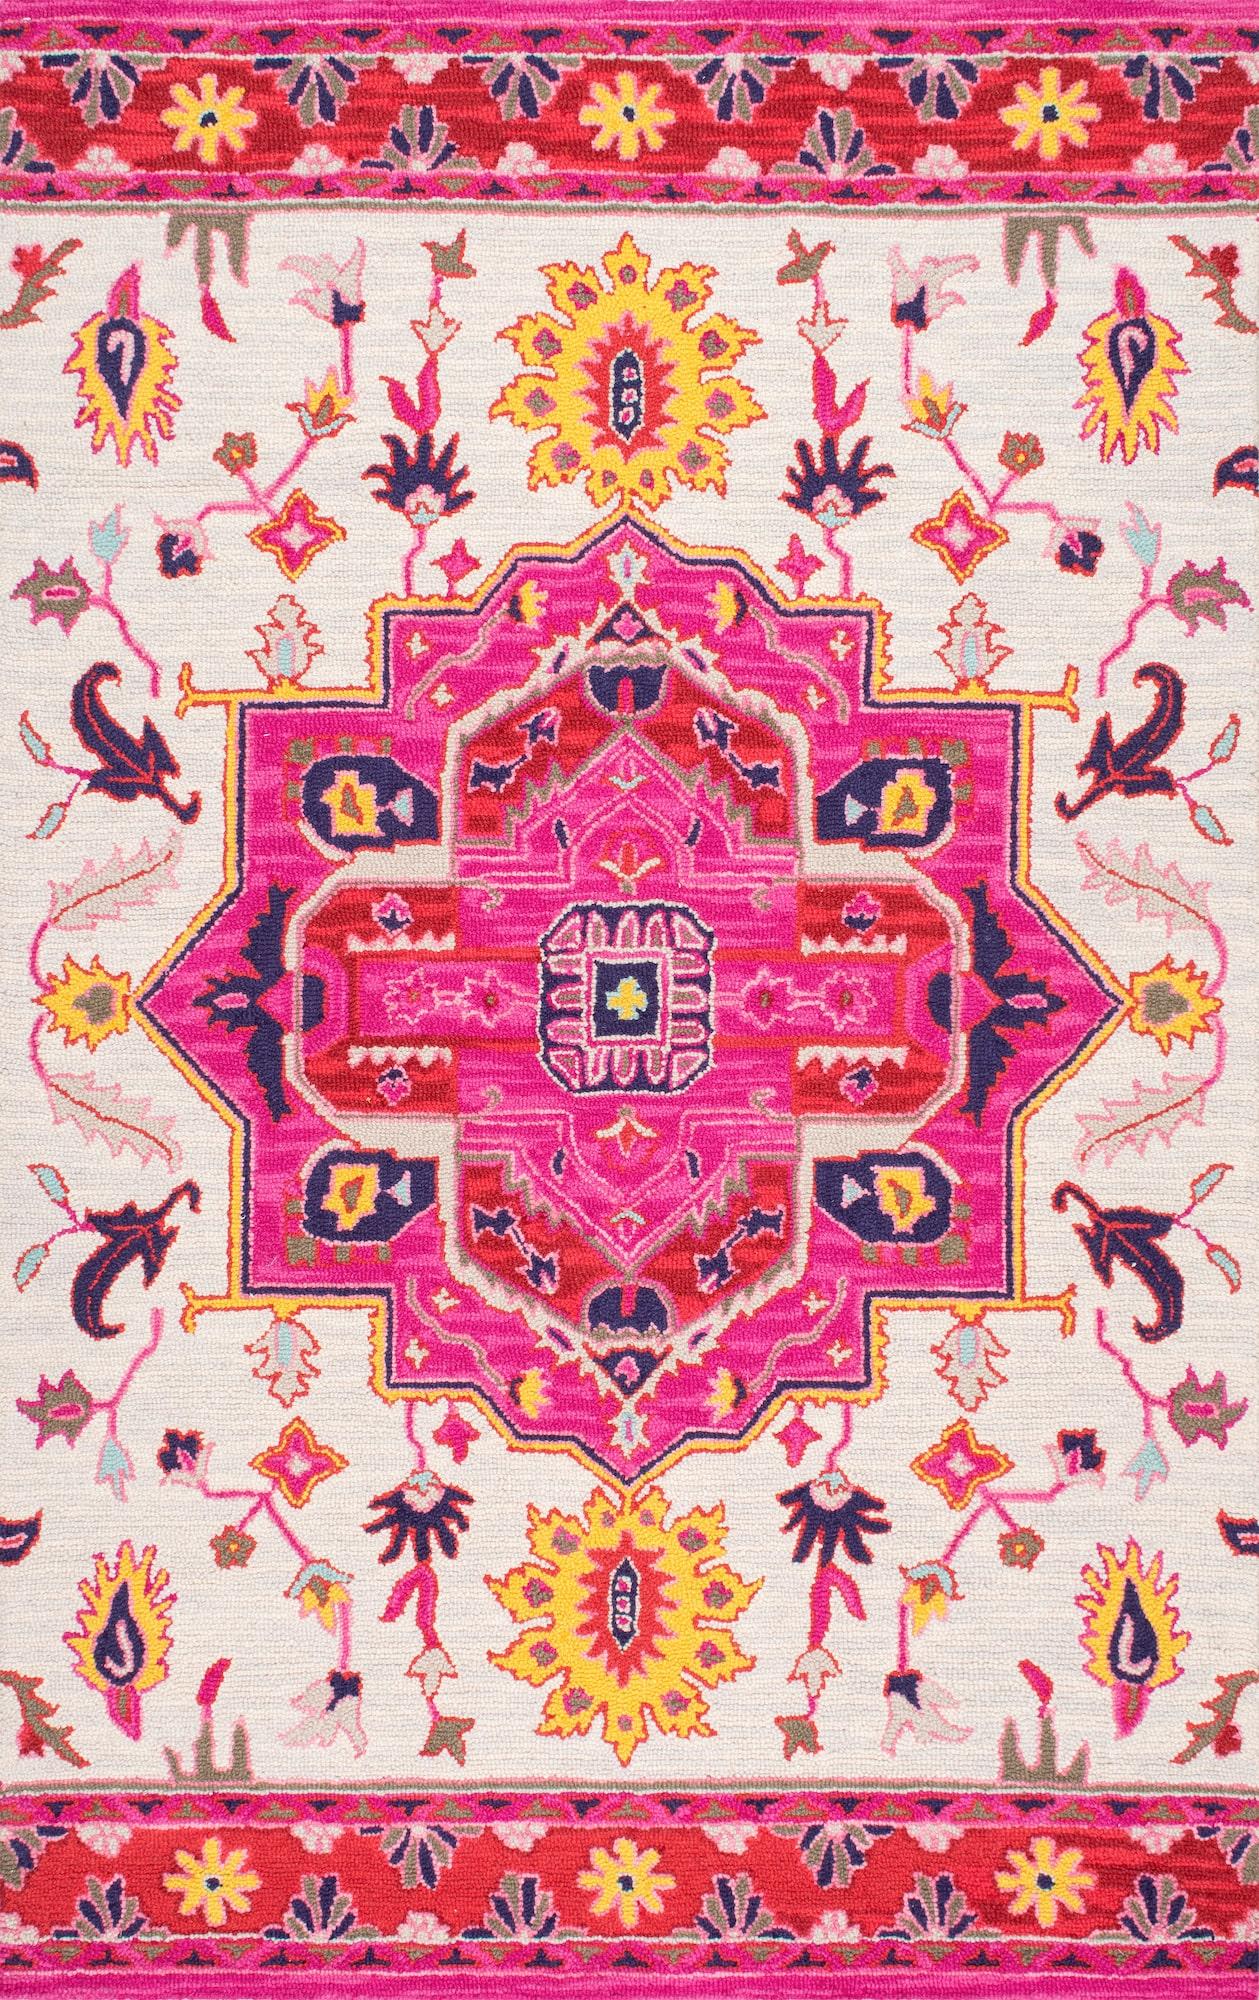 beautiful rugs, budget friendly rugs, home decor, rugsusa, bold rugs, boho style rugs, vintage rugs